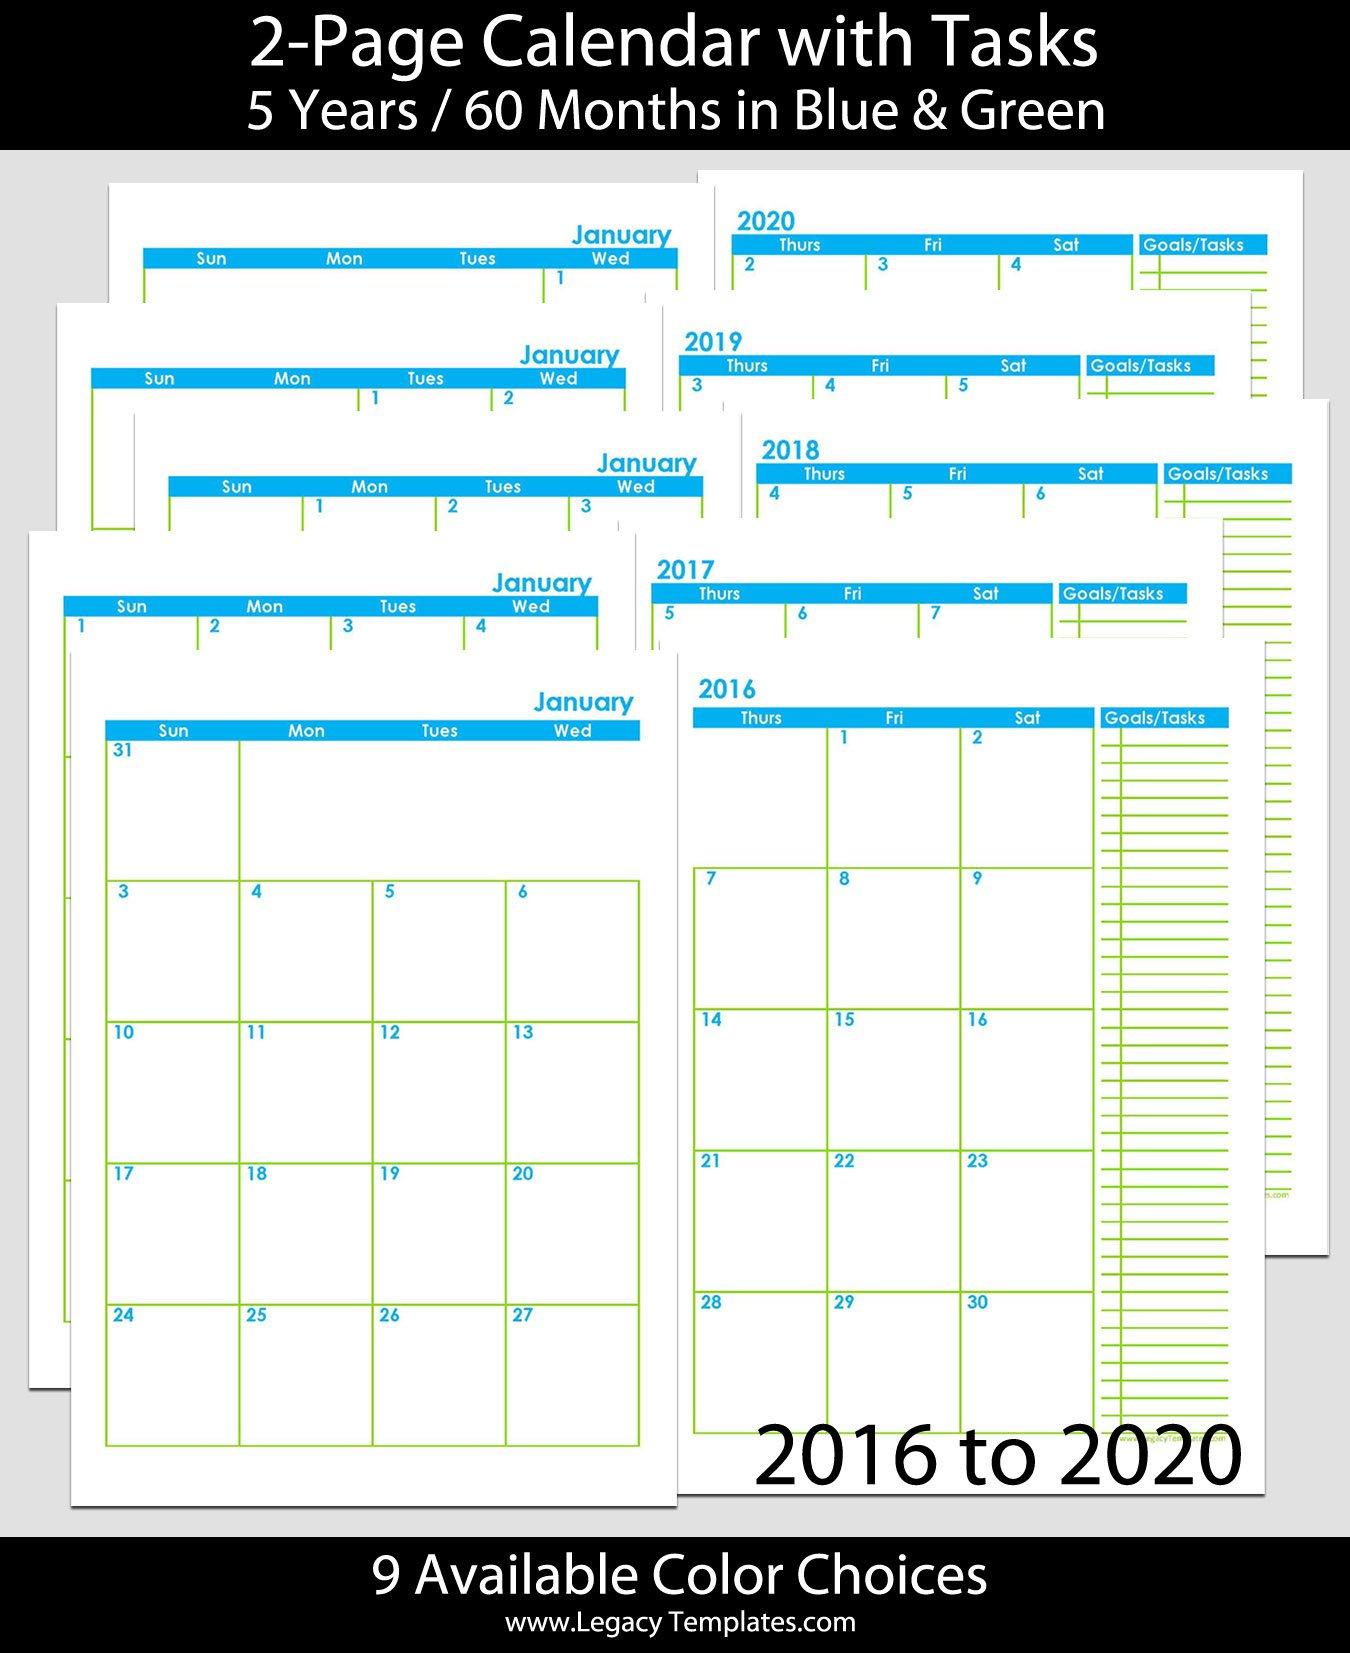 2016 Thru 2020 60-Months 2-Page Calendar - A5 | Legacy Free 8.5 X 5.5 Printable Calendar